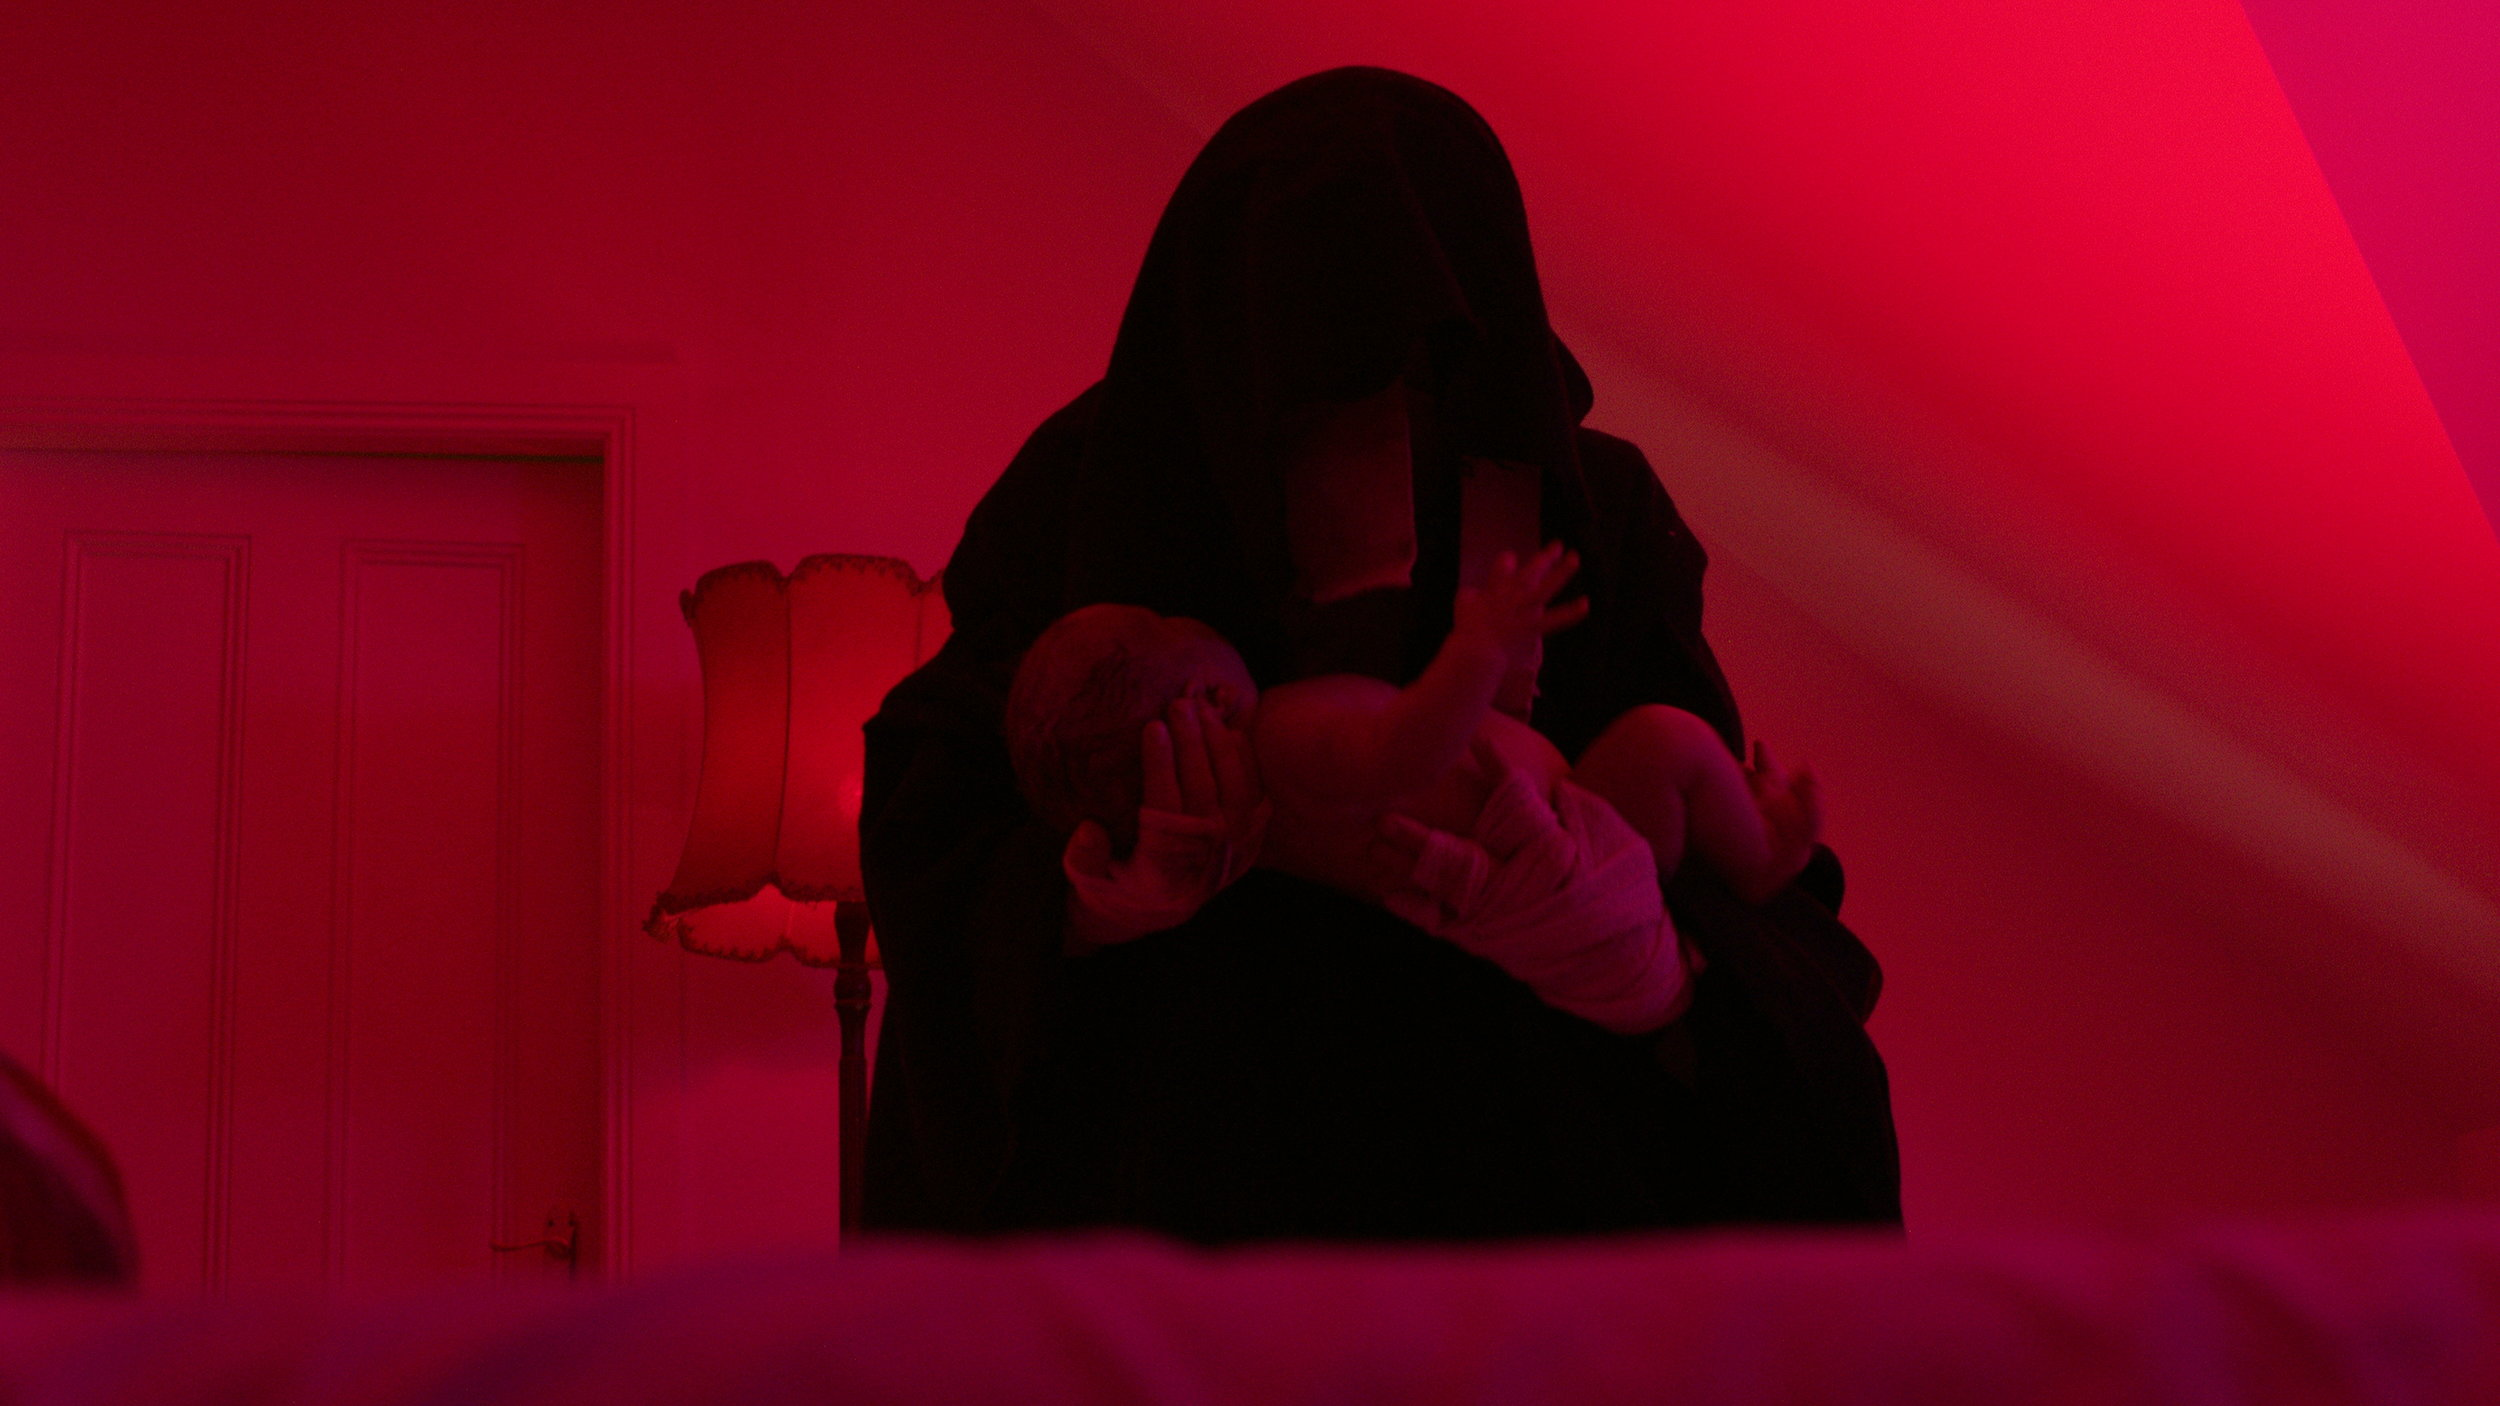 Cletus and baby - Red Christmas Photo by Douglas Burdorff.jpeg